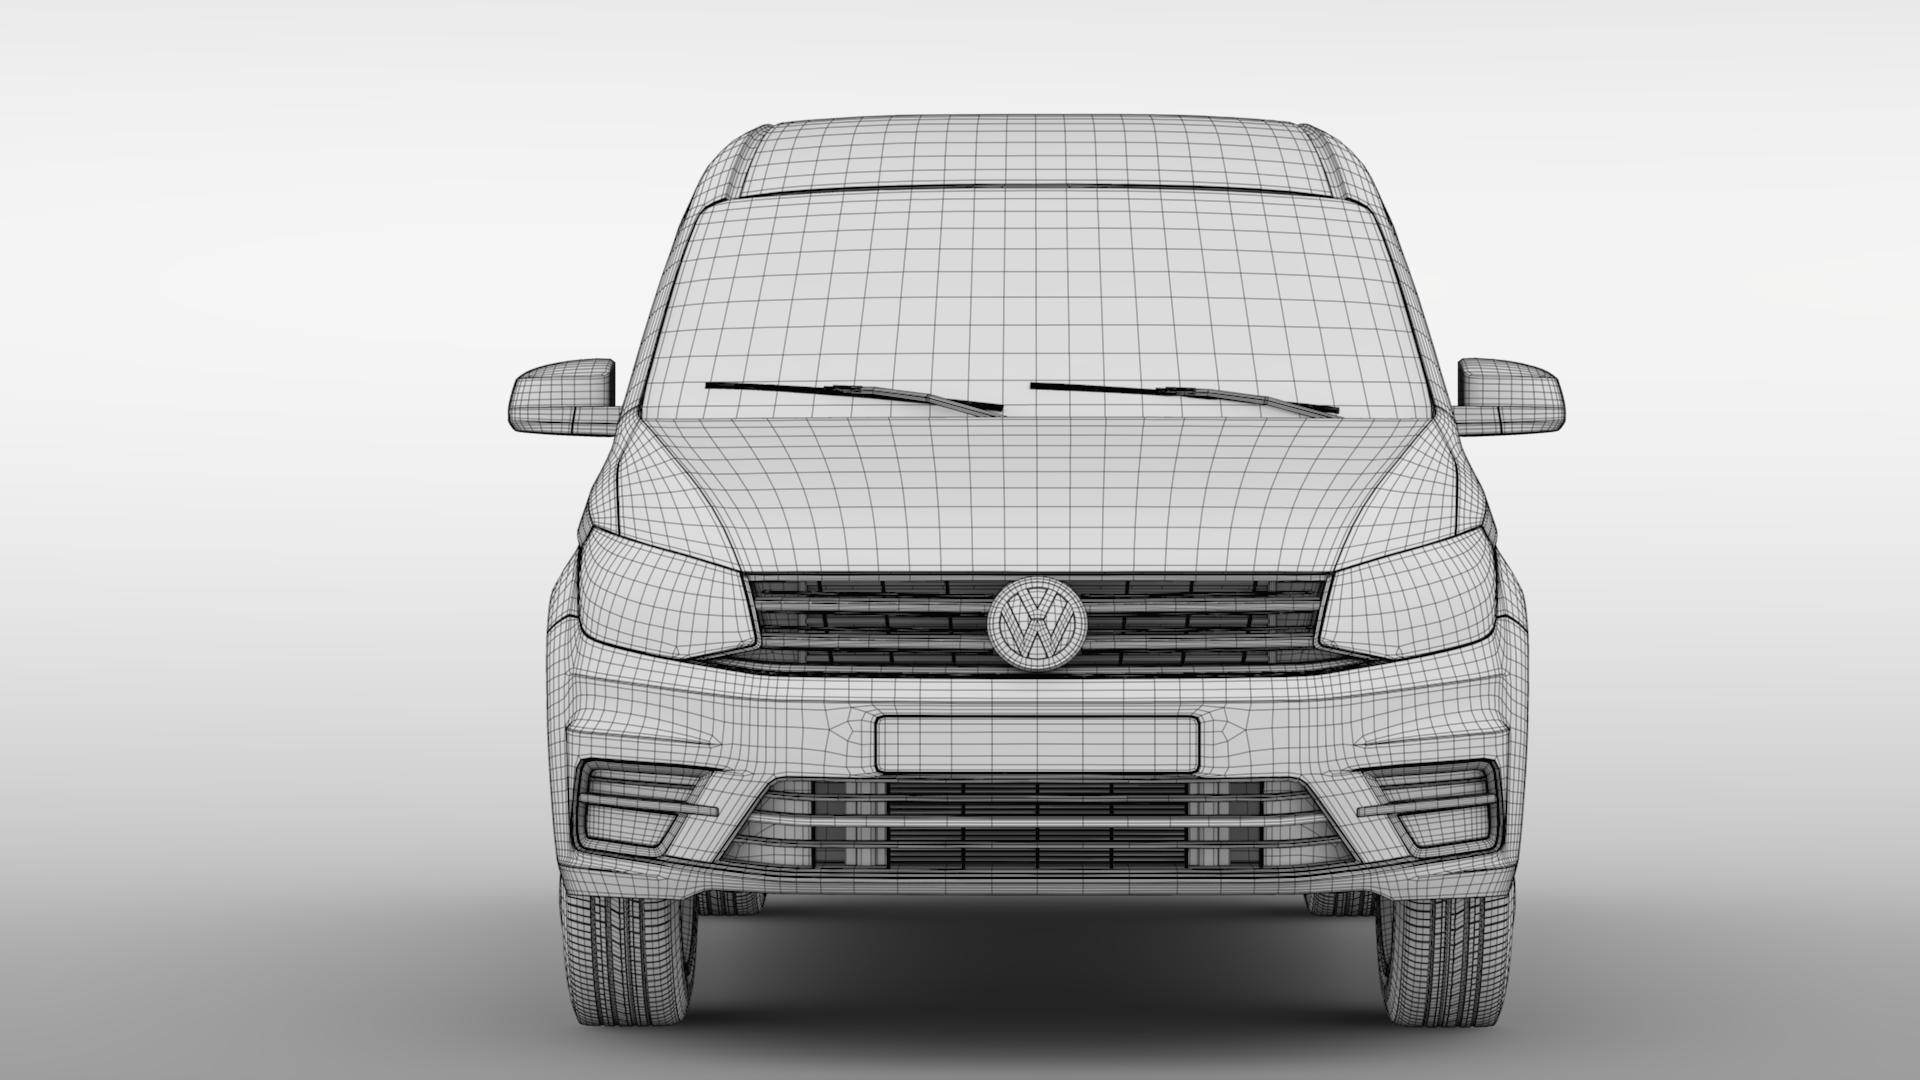 volkswagen caddy 2018 3d model max fbx c4d lwo ma mb hrc xsi obj 283812